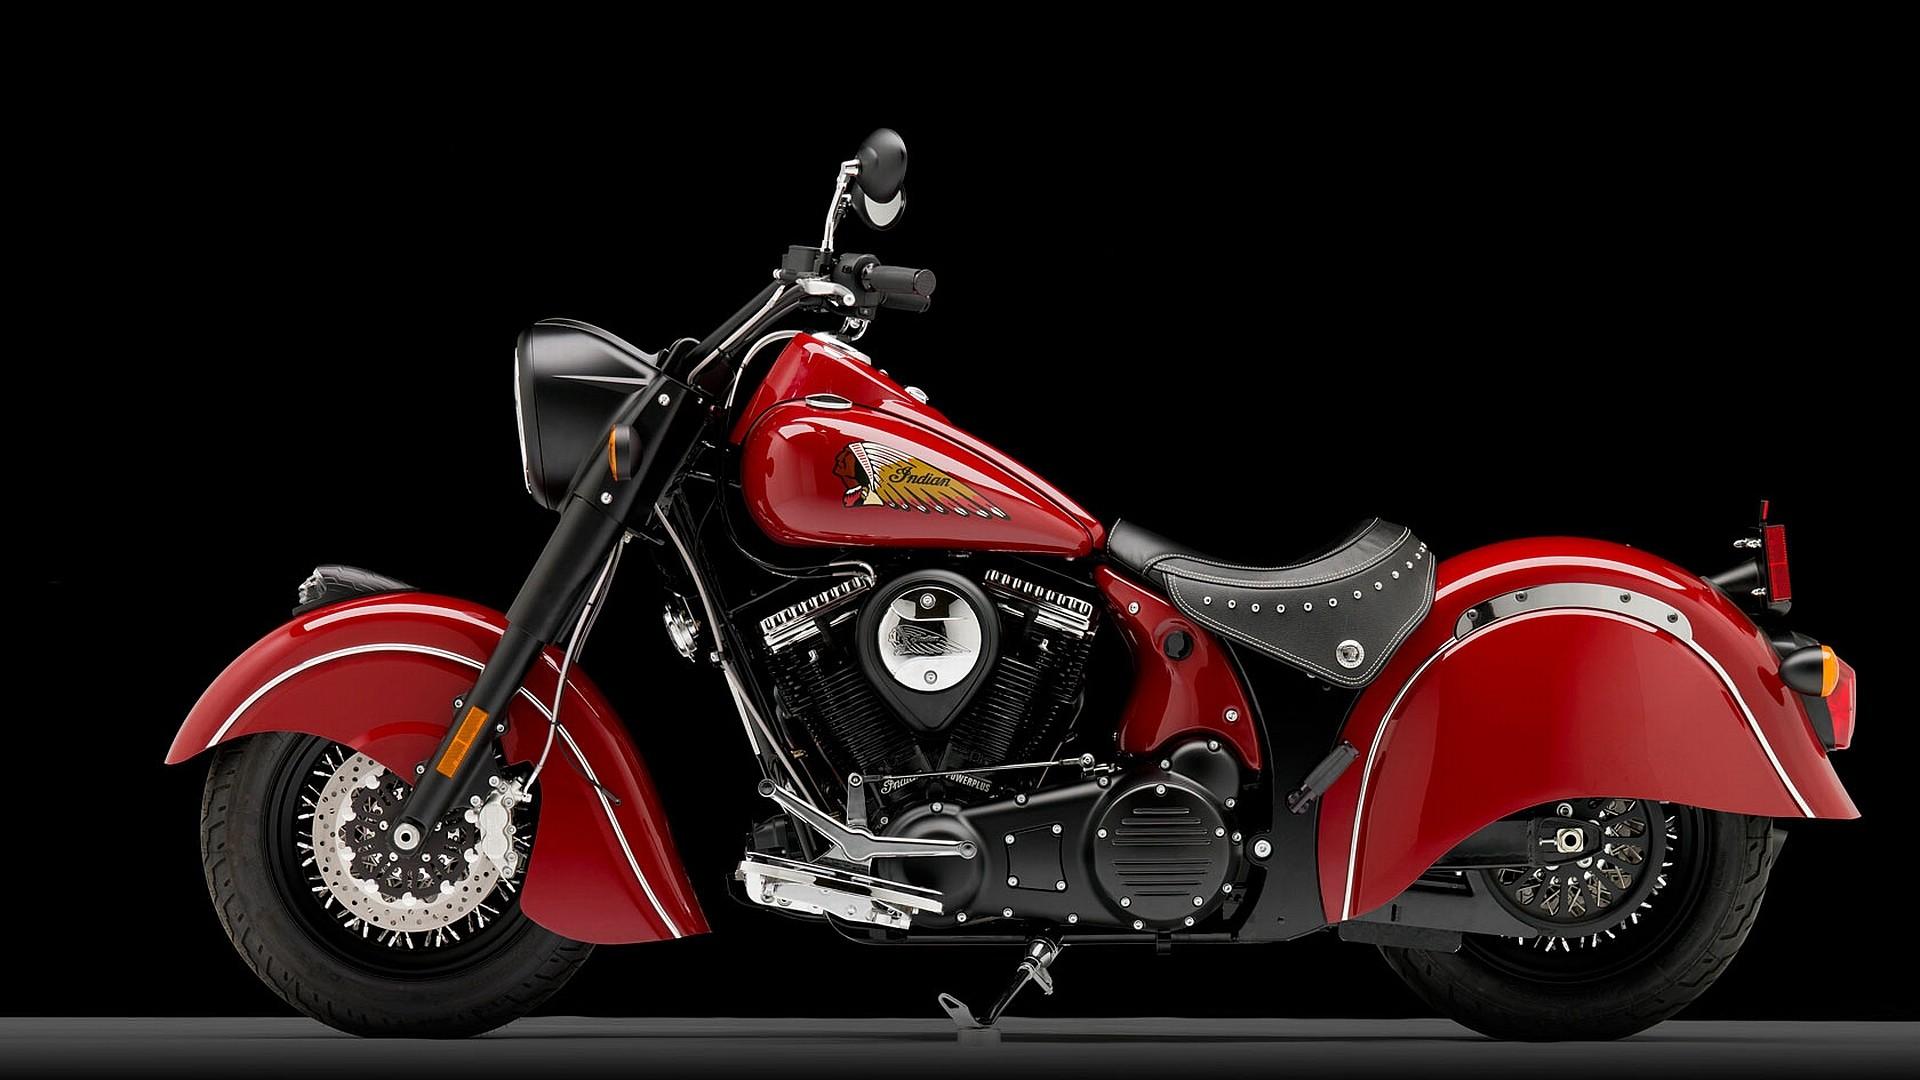 Res: 1920x1080, Motorcycles Wallpaper Desktop (52 images). Motorcycle ...